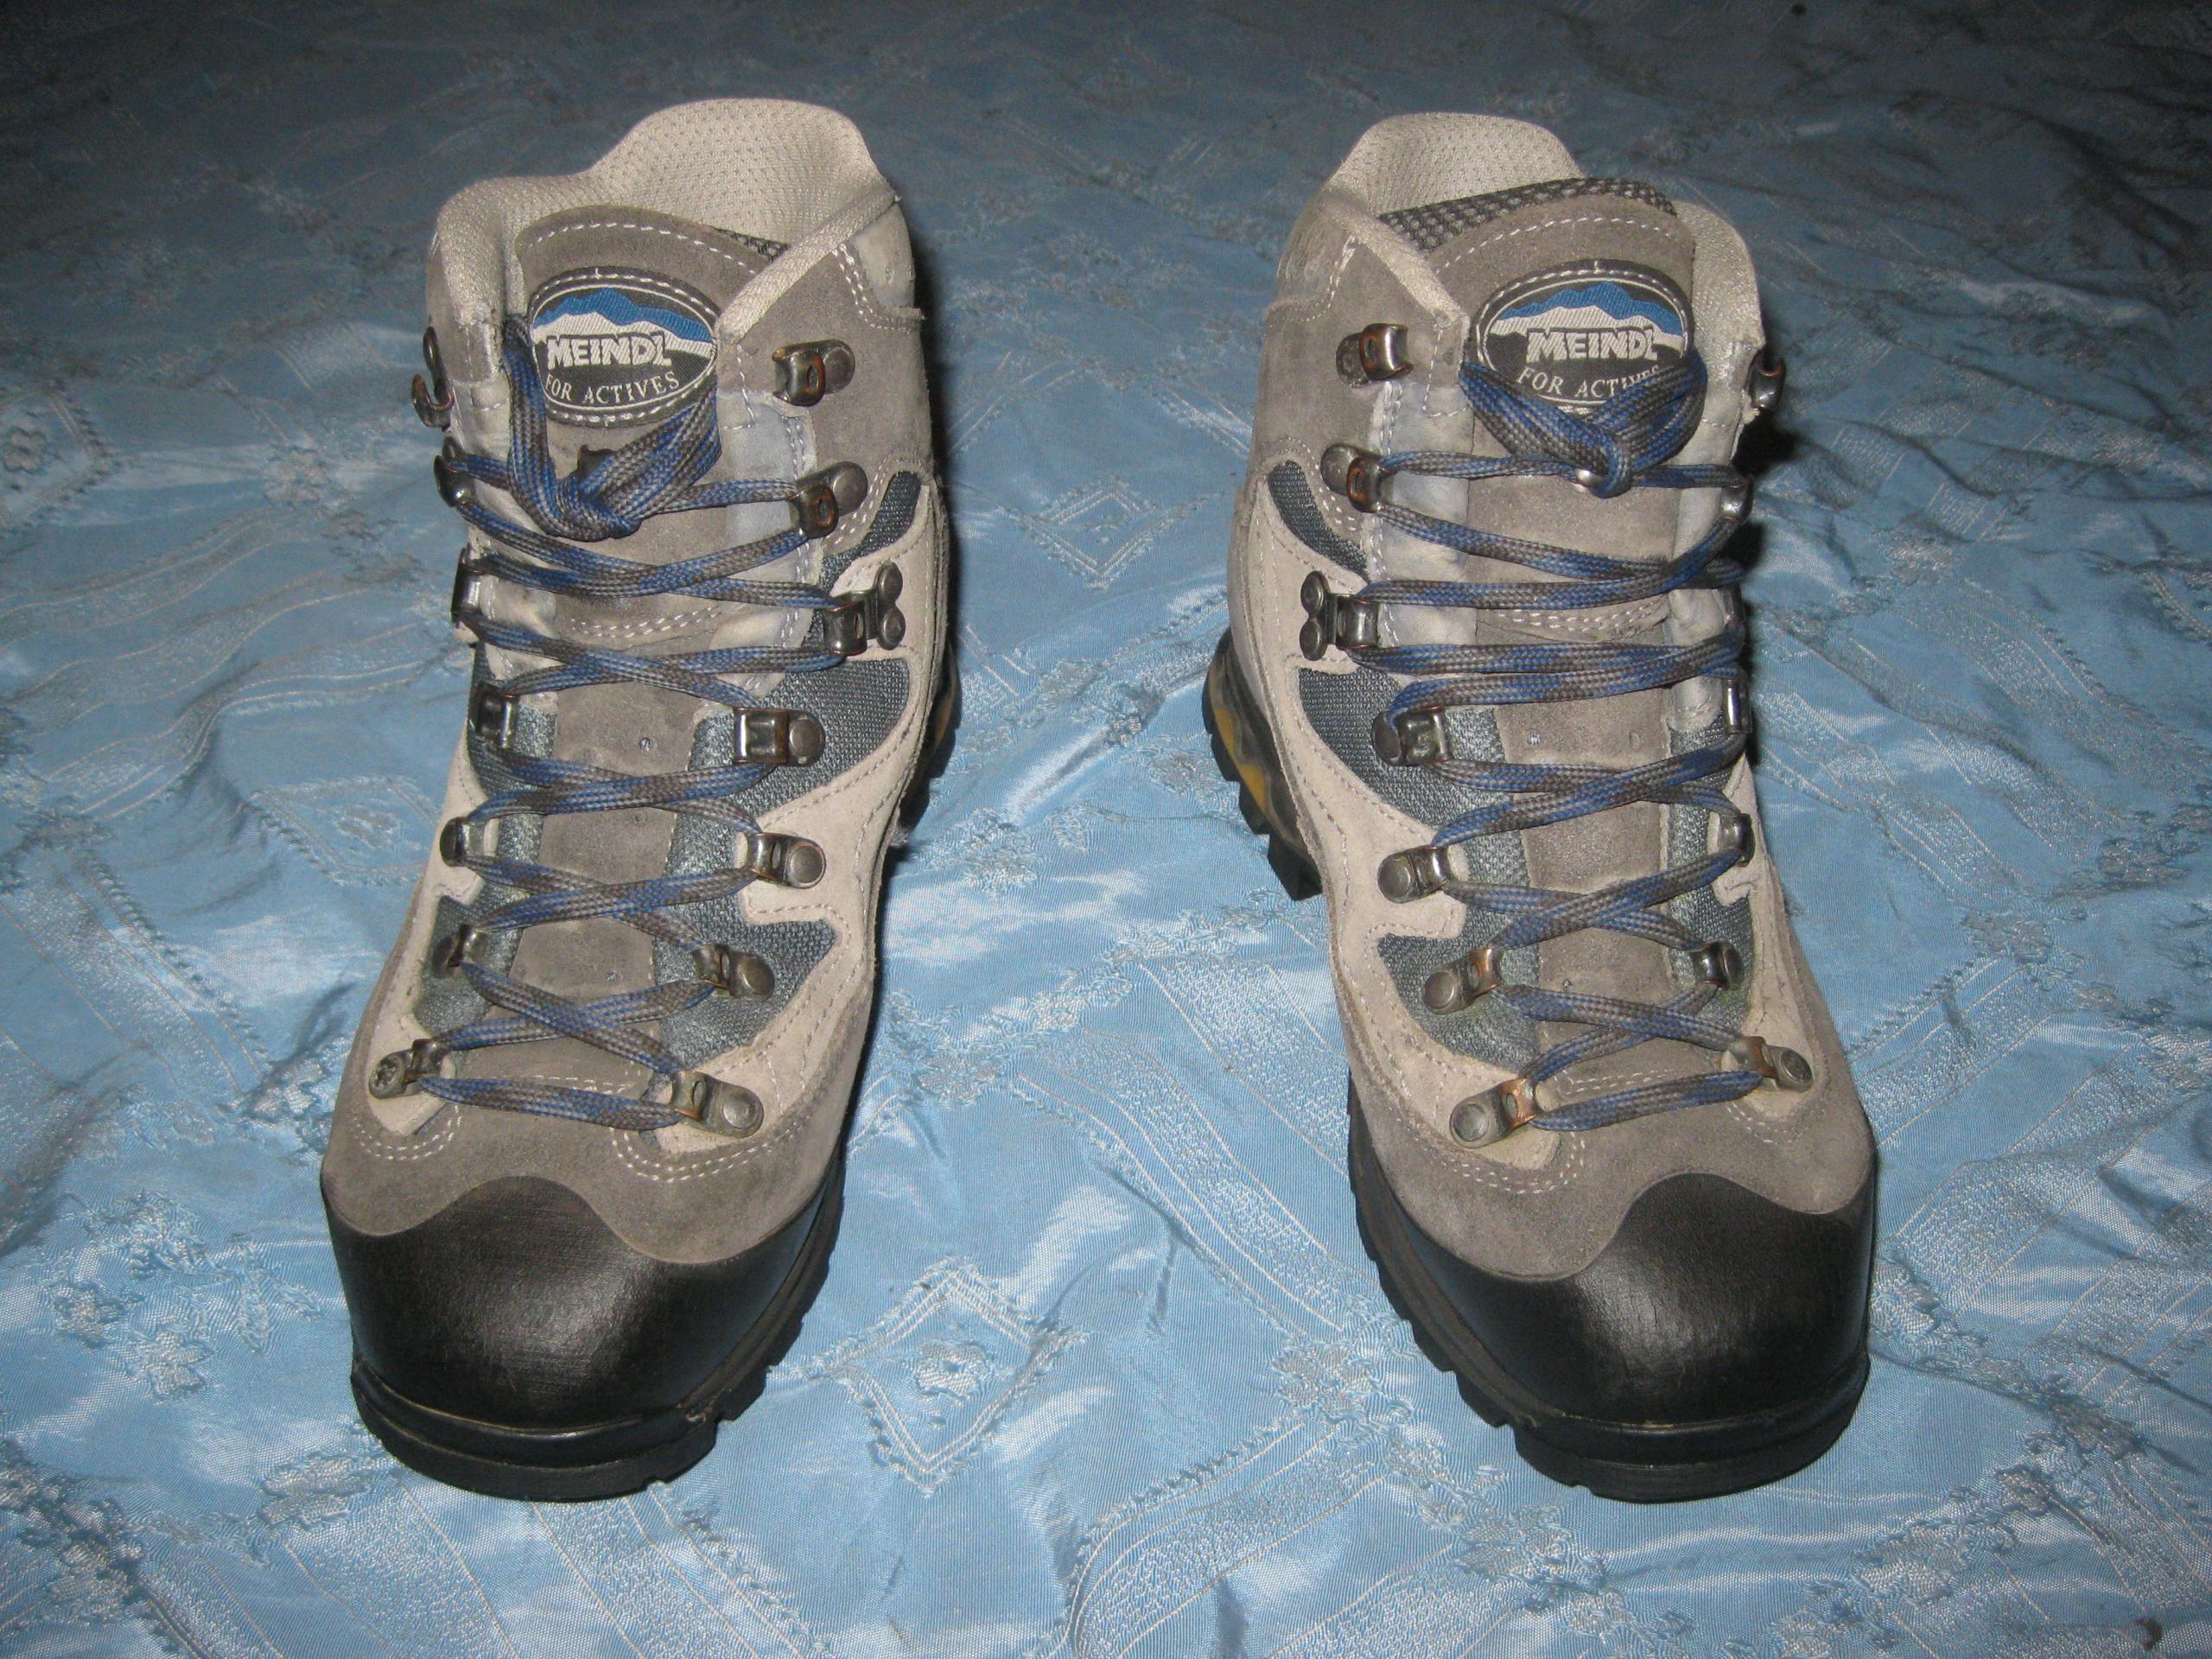 MEINDL gore tex buty górskie,trekingowe 38 (5)25cm